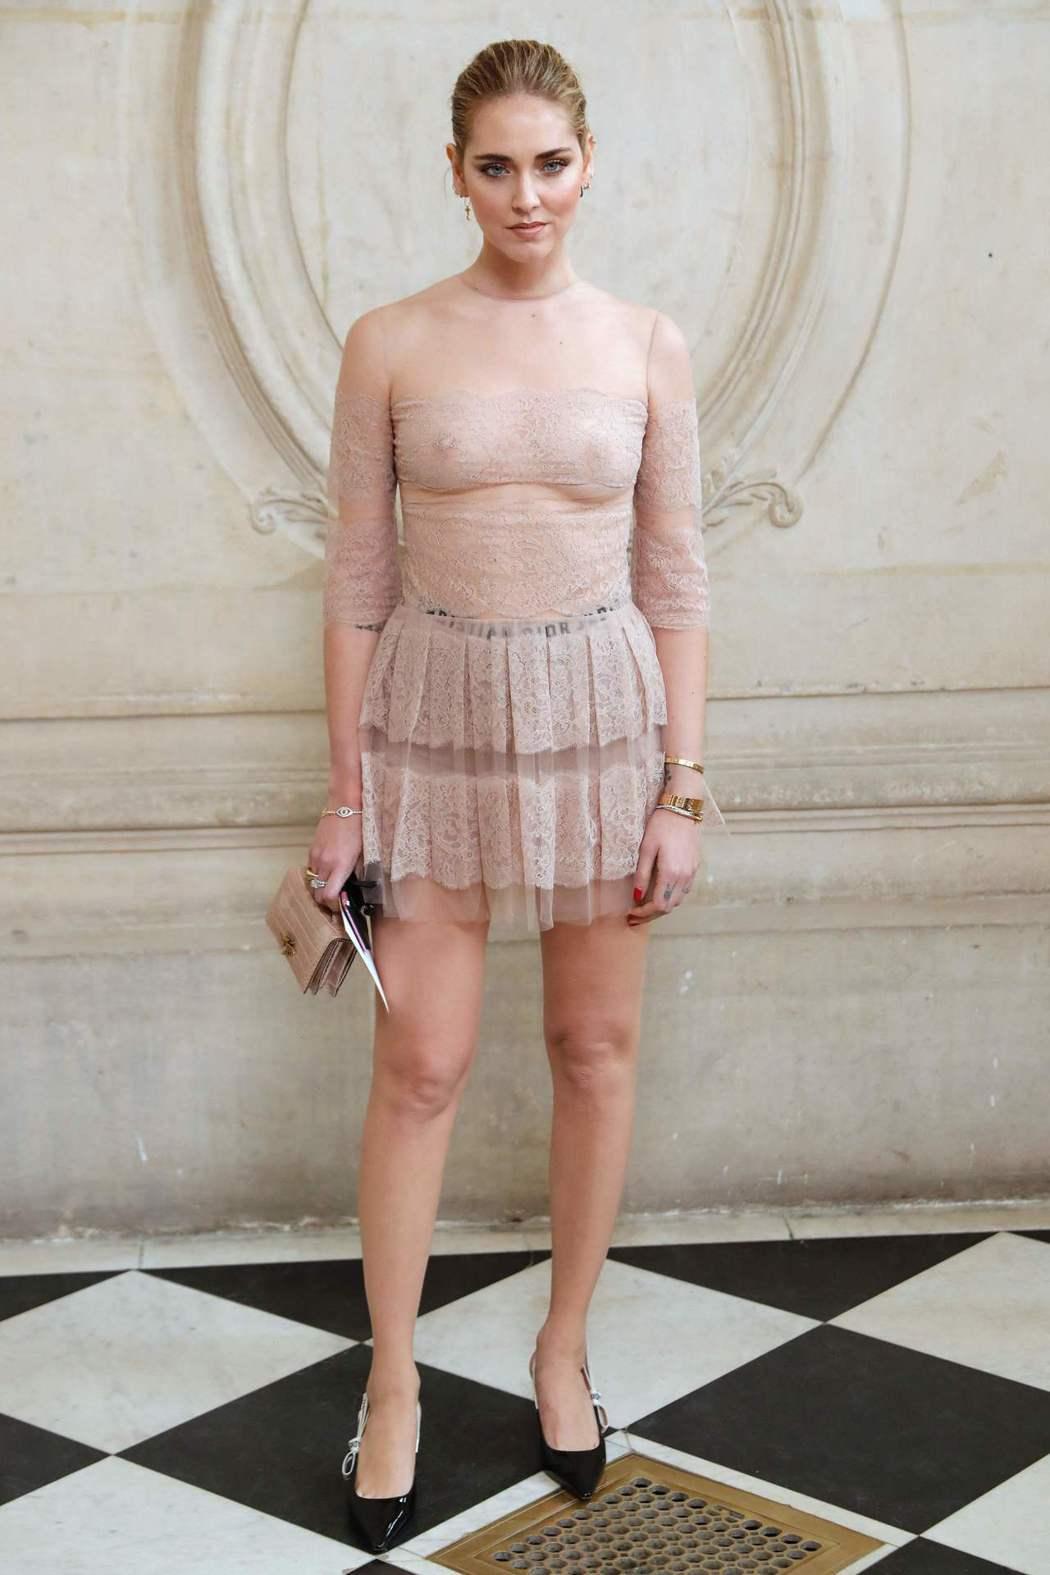 Chiara Ferragni「裸」視感徹底。(法新社)